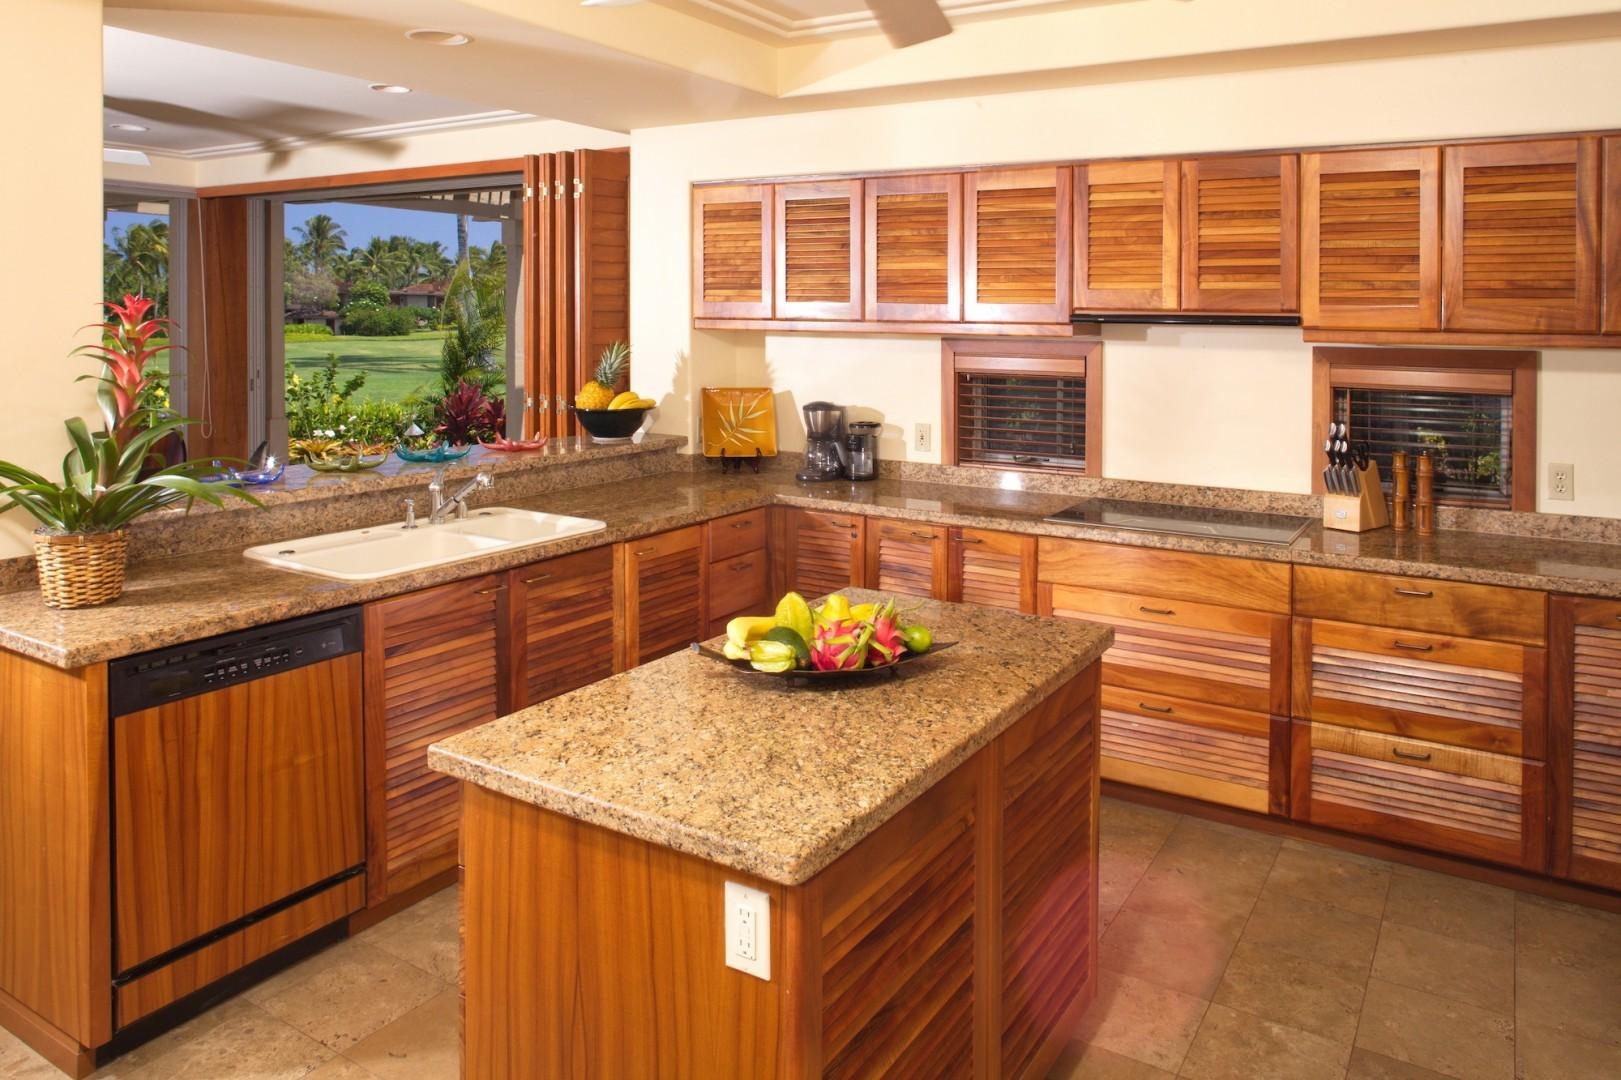 Elegant gourmet modern kitchen w/granite countertops and top tier appliances.